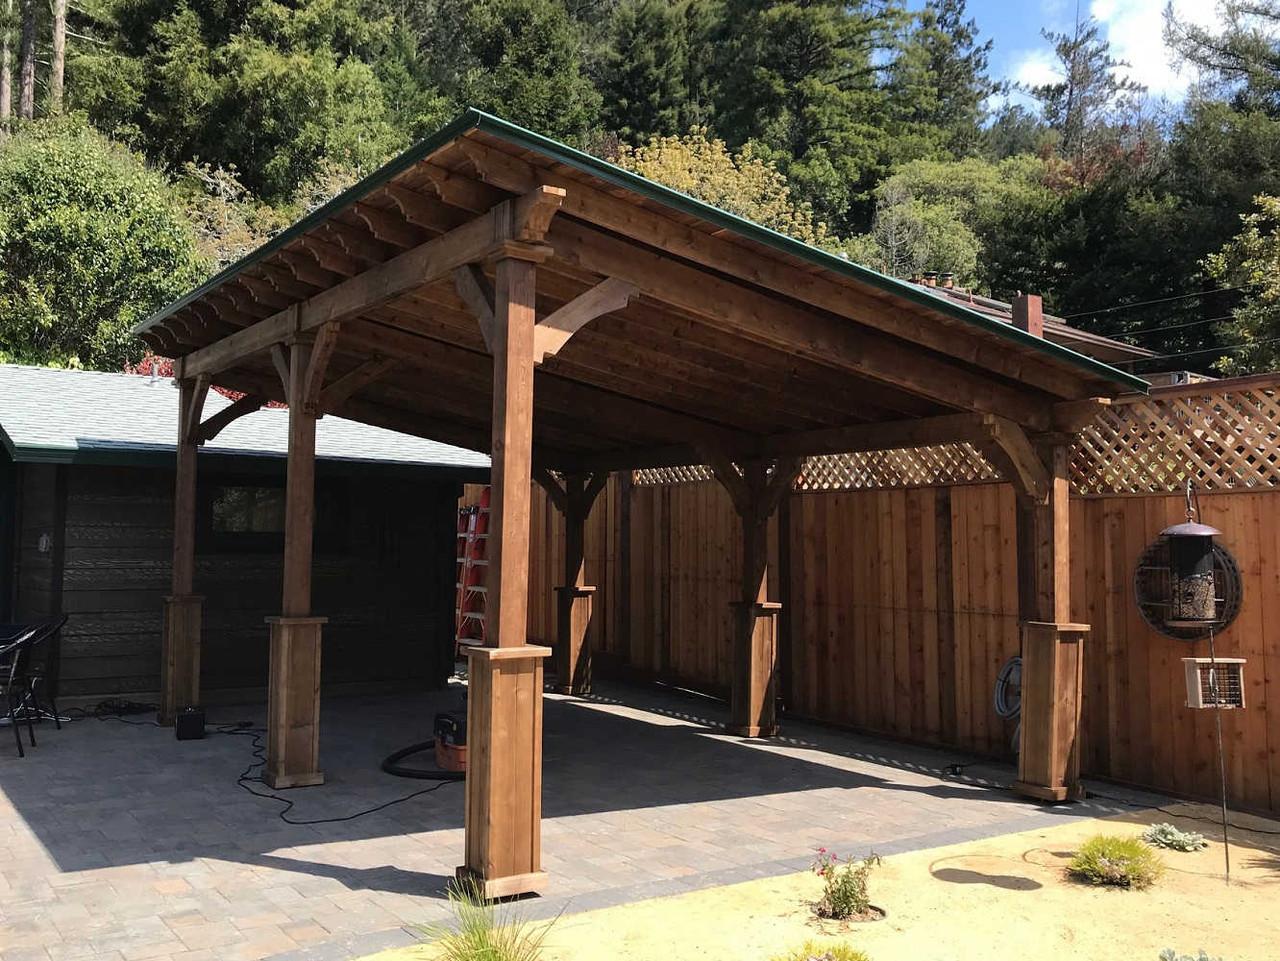 12x18 Lean-To Cedar Pavilion Kit, Guerneville, California